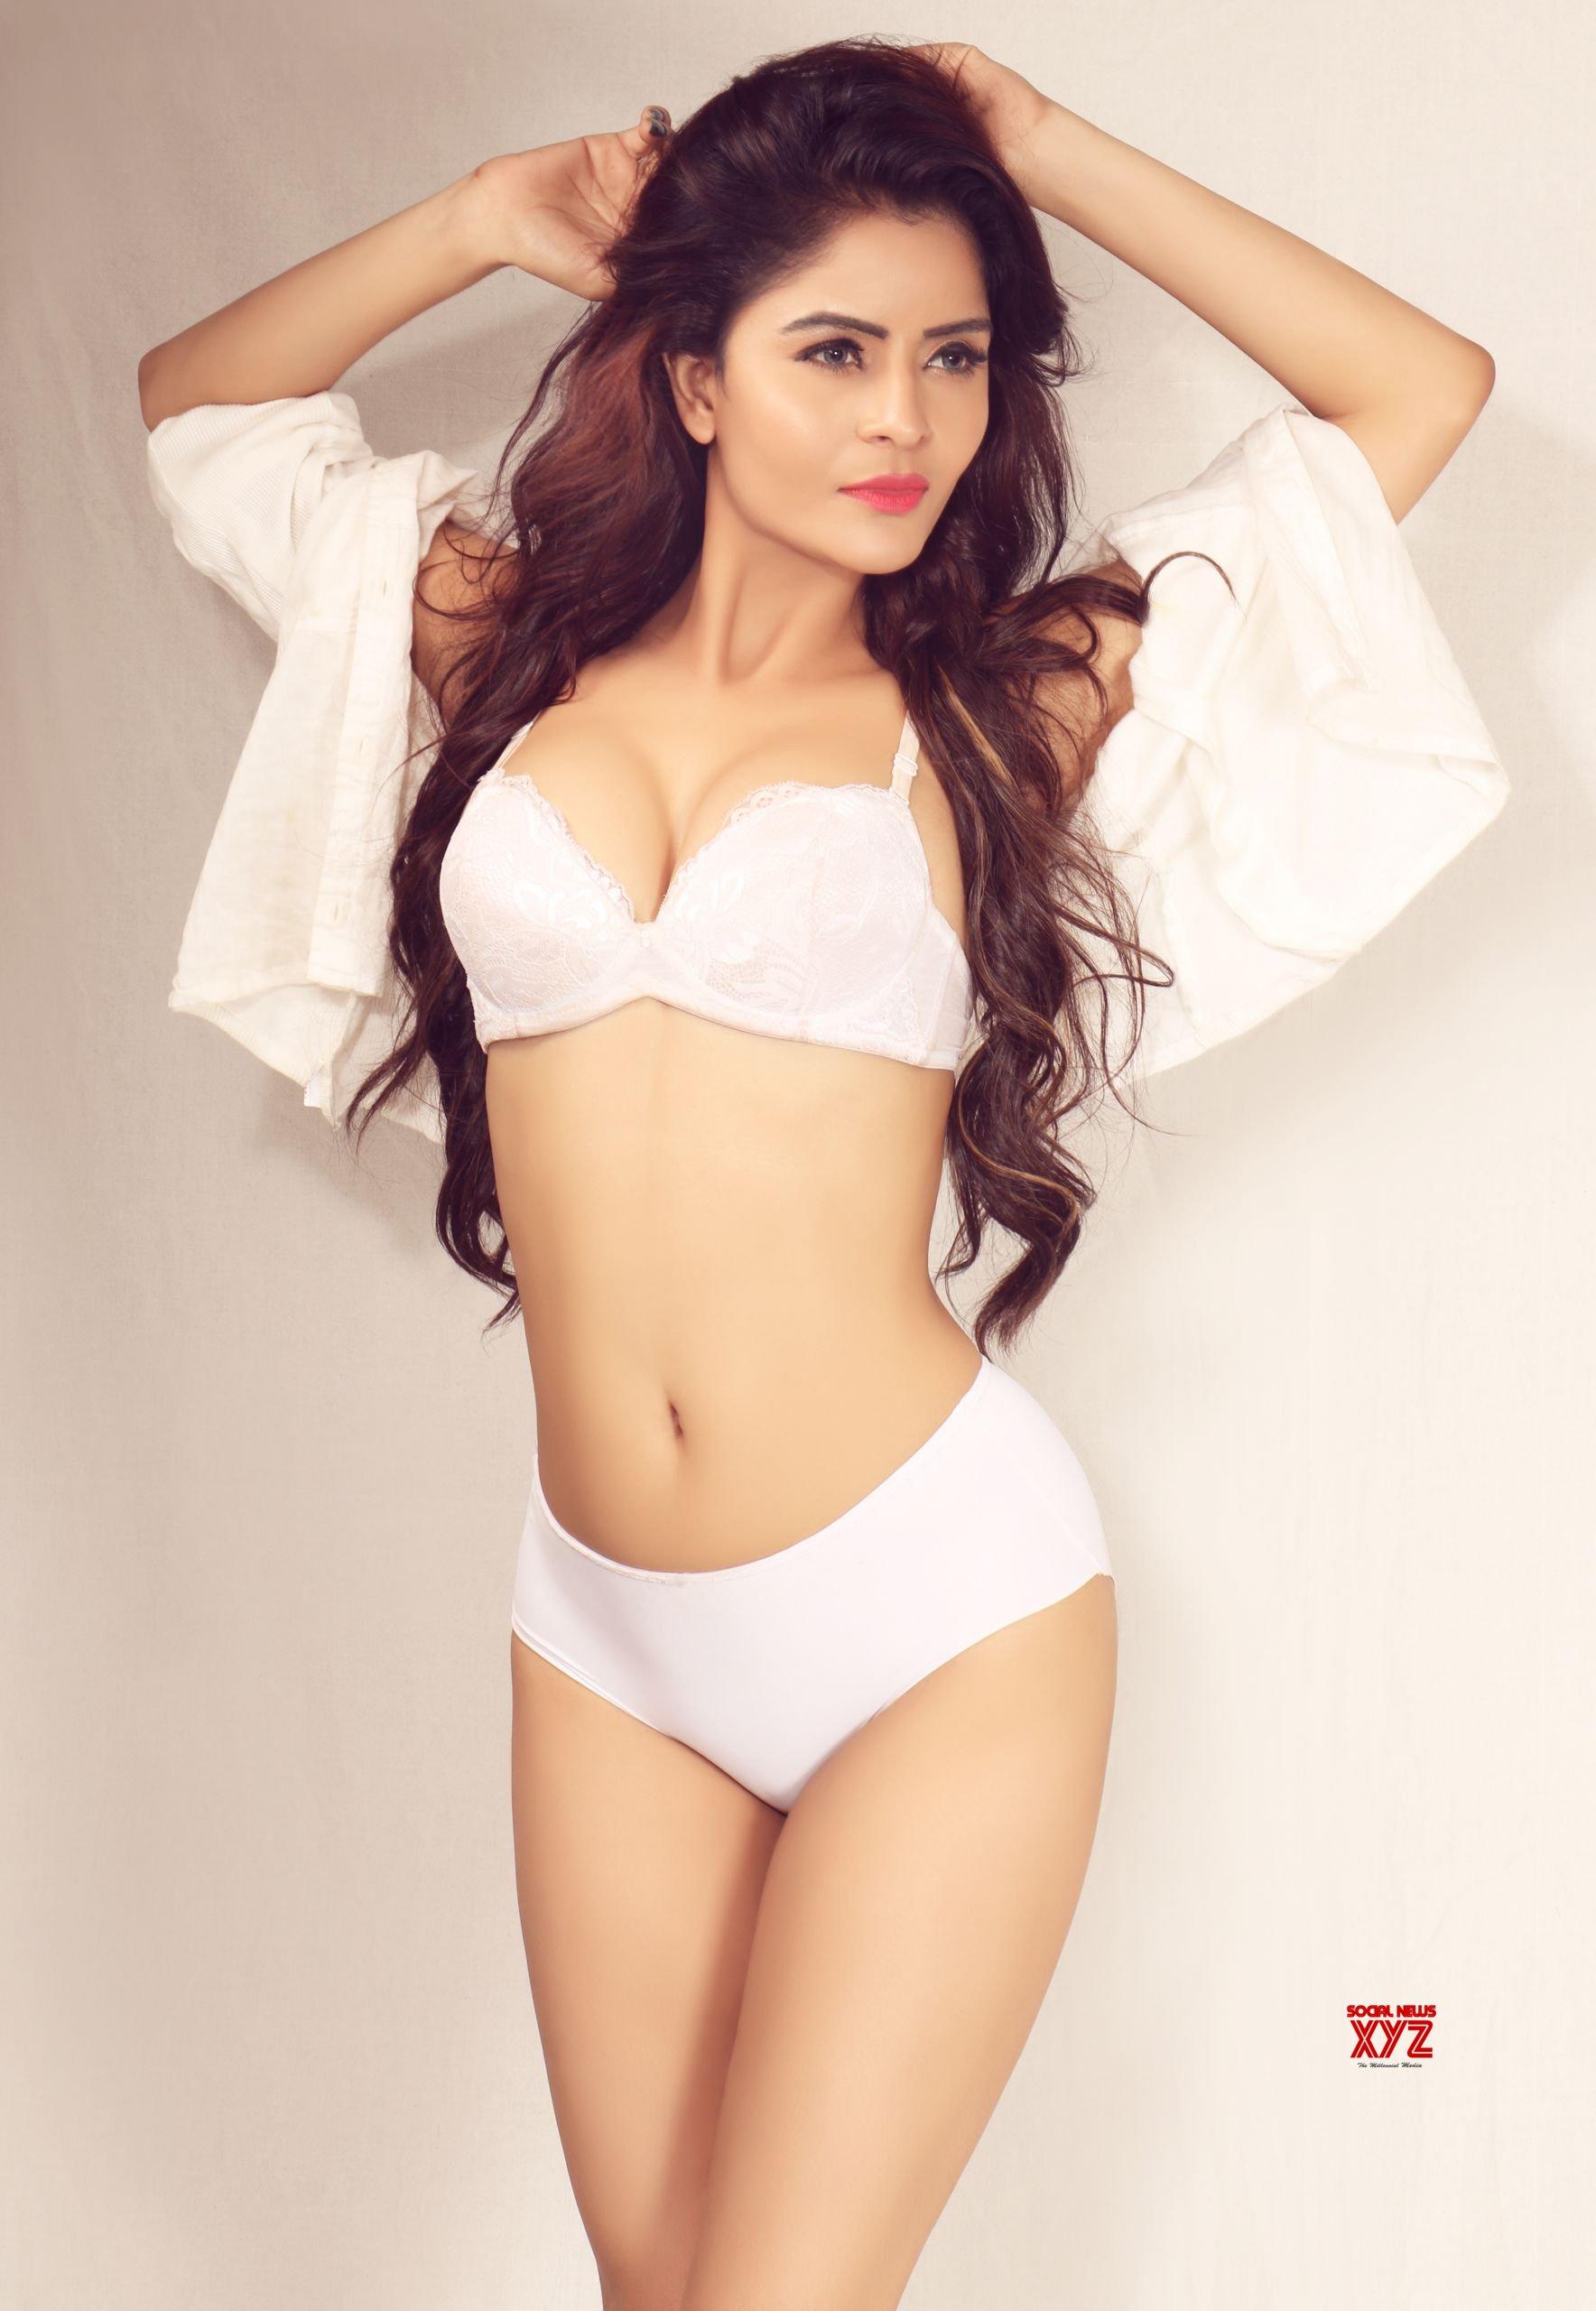 Actress Gehana Vasisth Latest Hot HD Stills From Sensual And Exotic Shoot With Fabglam Studios